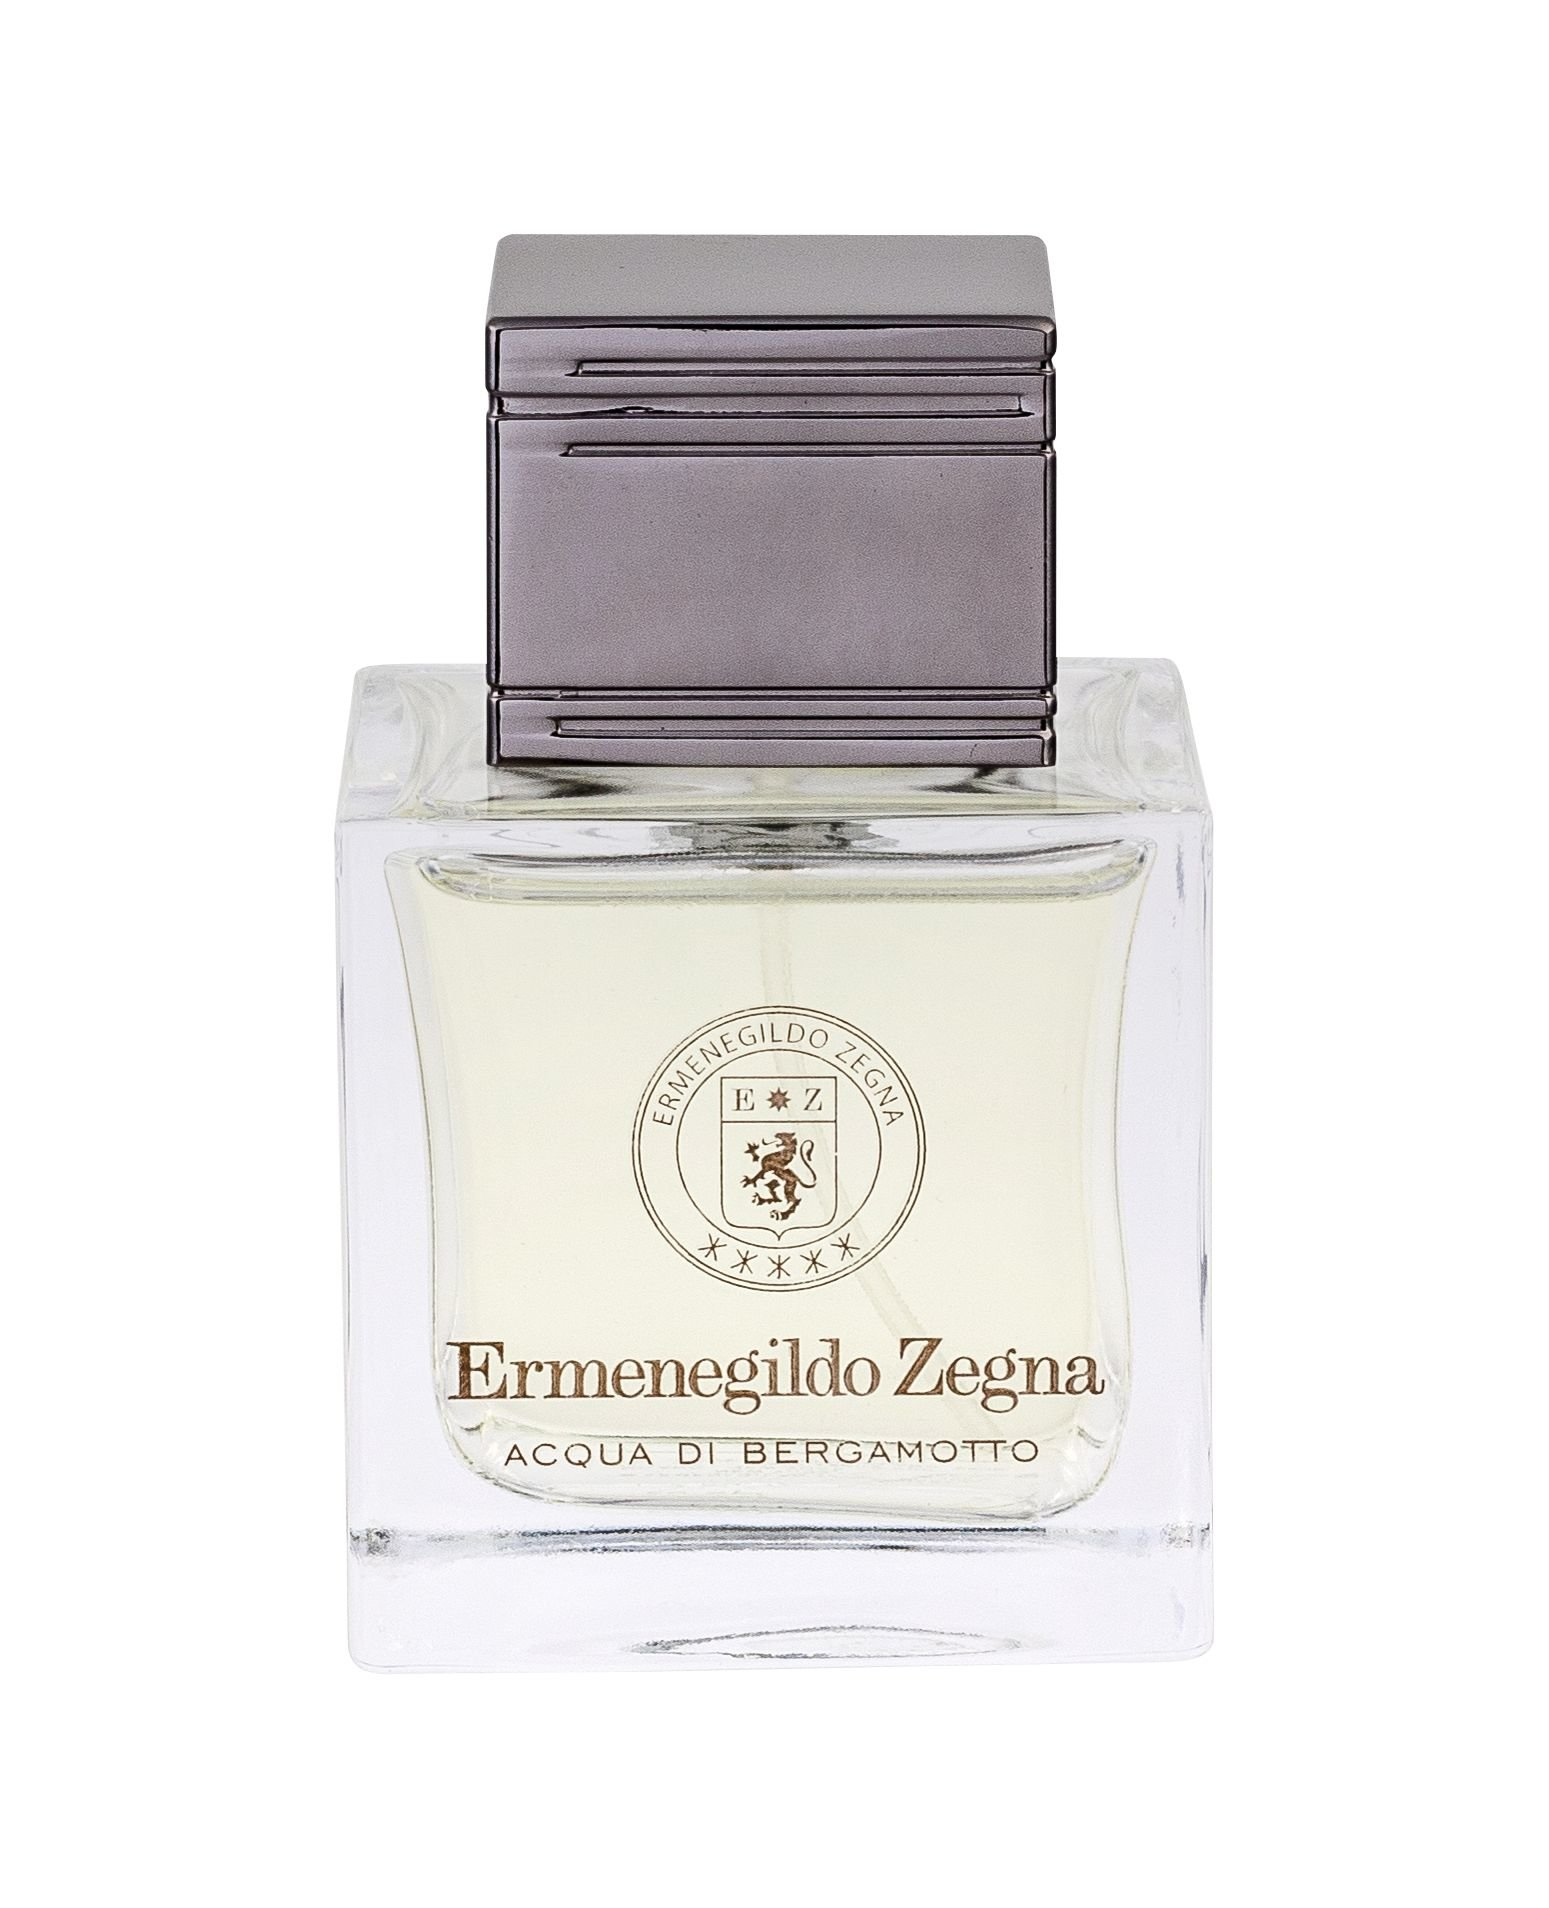 Ermenegildo Zegna Acqua di Bergamotto Eau de Toilette 50ml